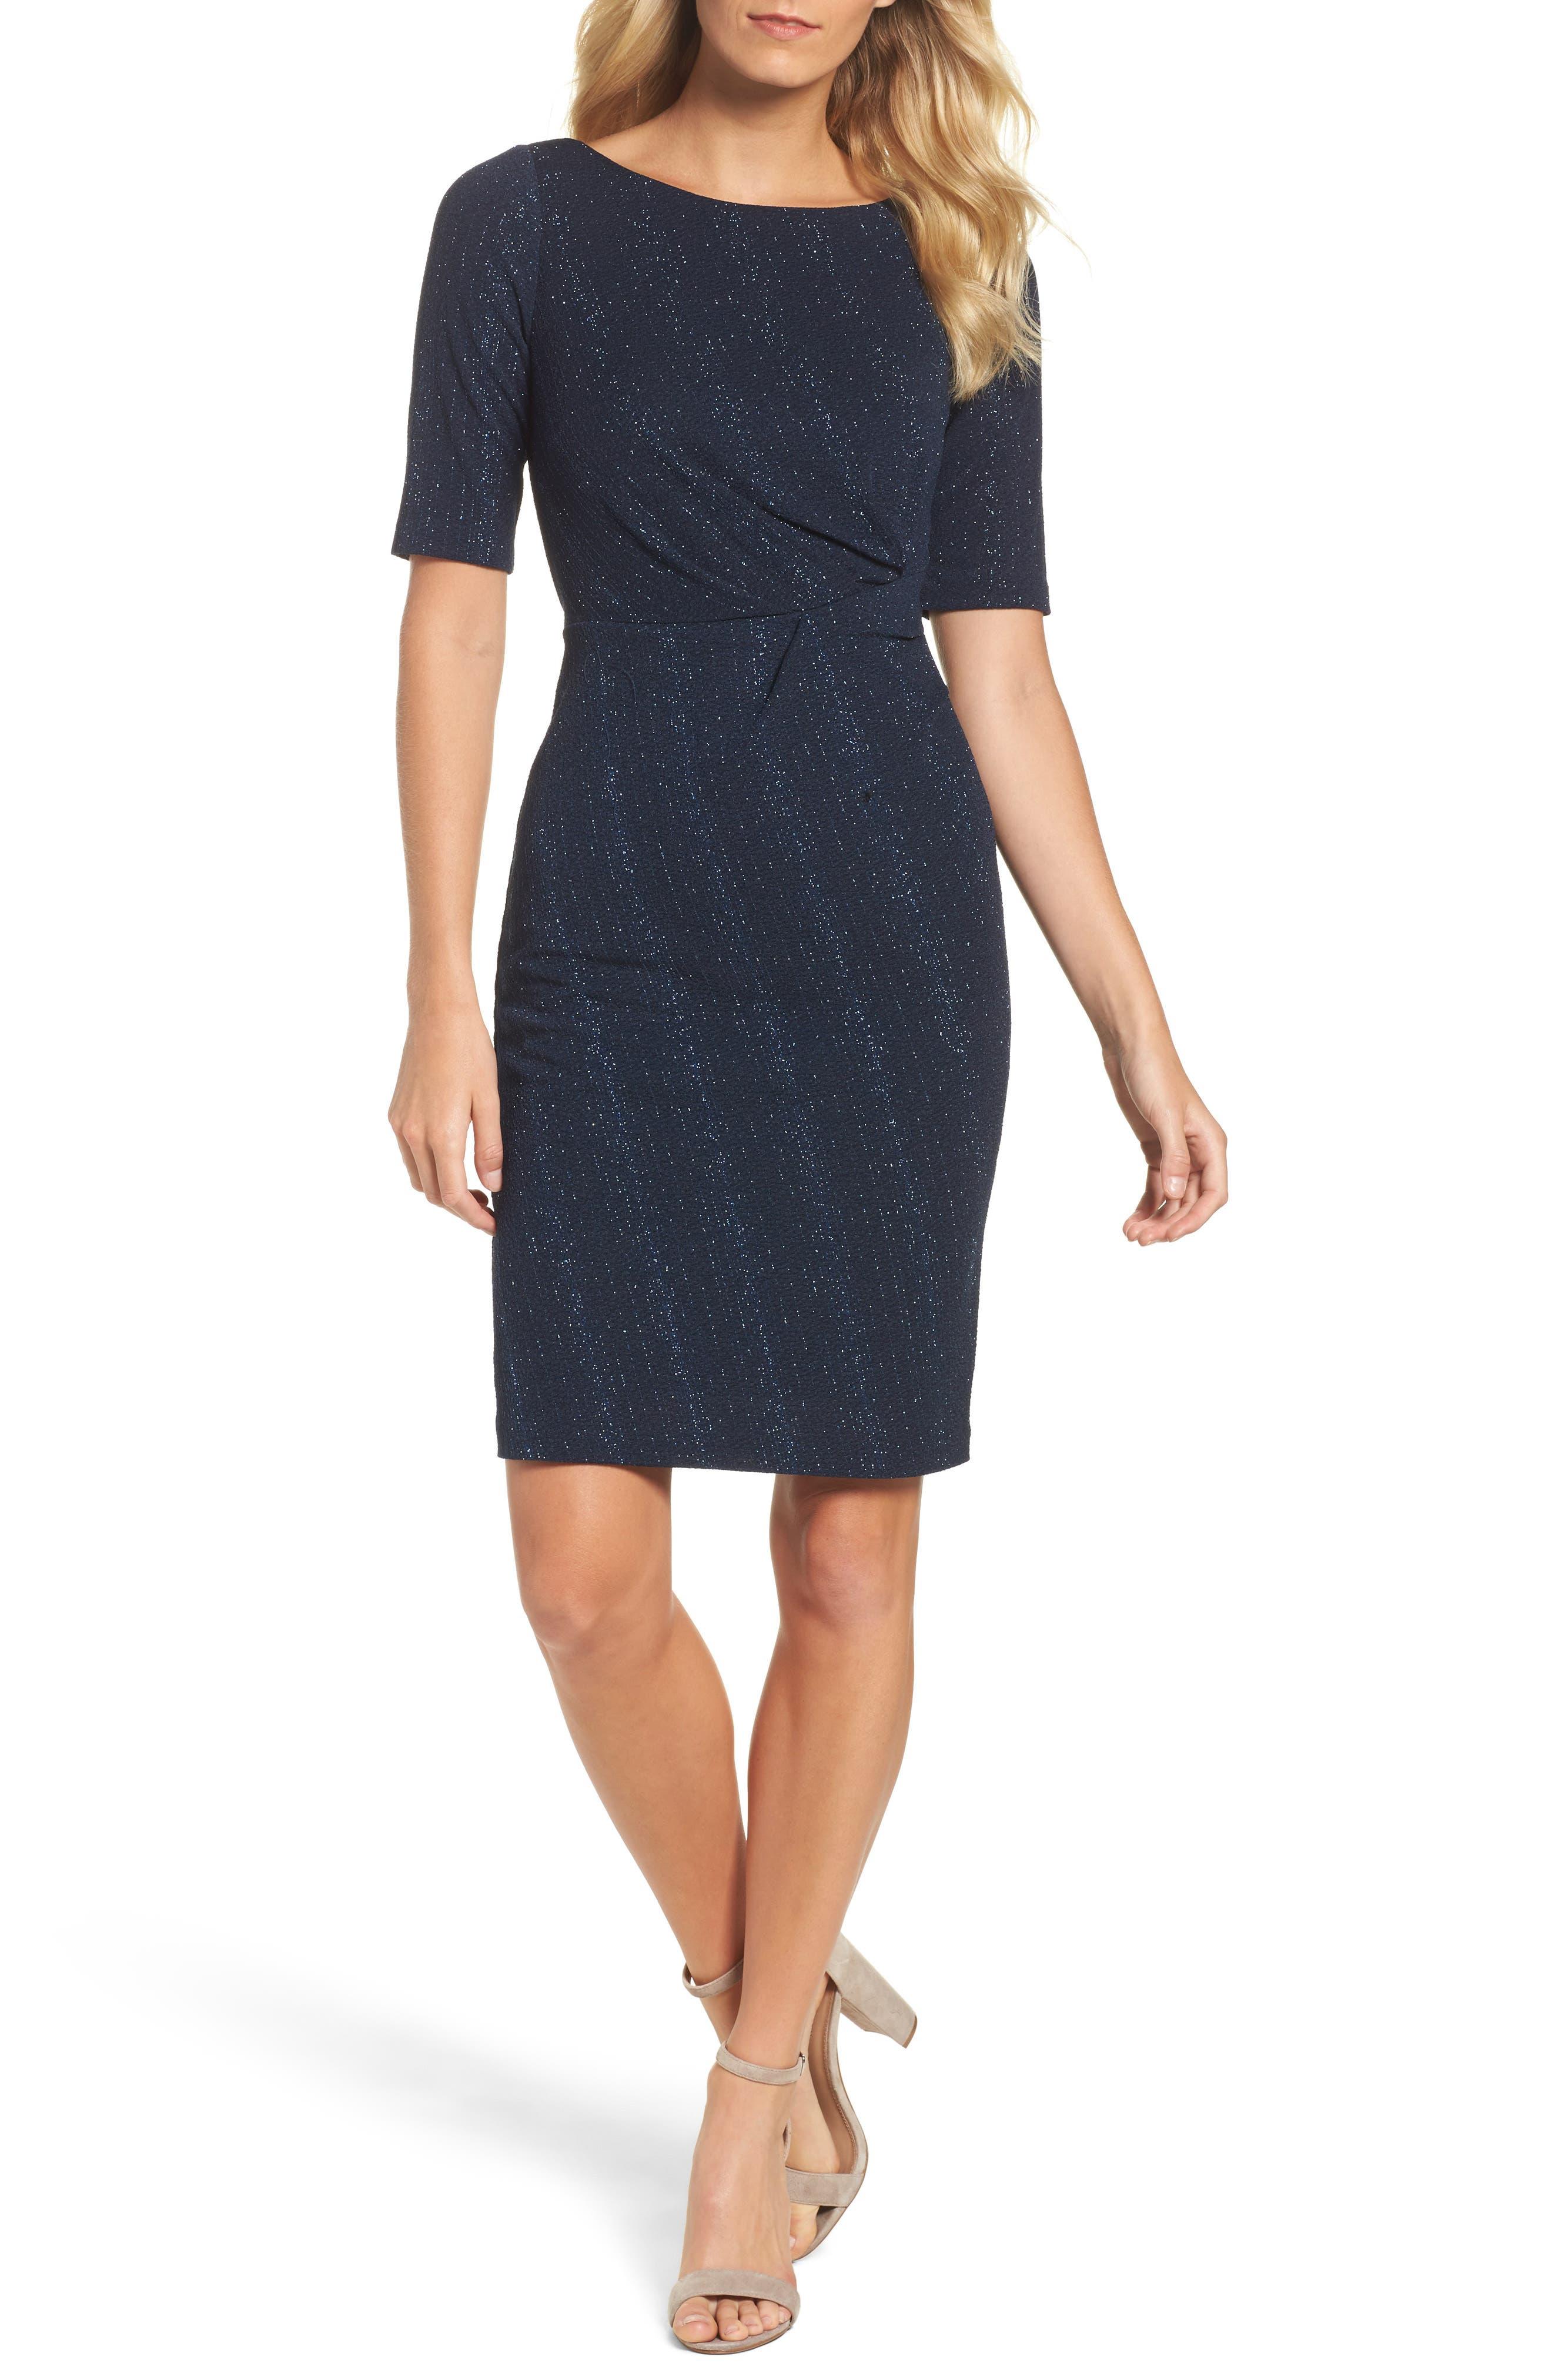 Main Image - Adrianna Papell Glitter Knit Sheath Dress